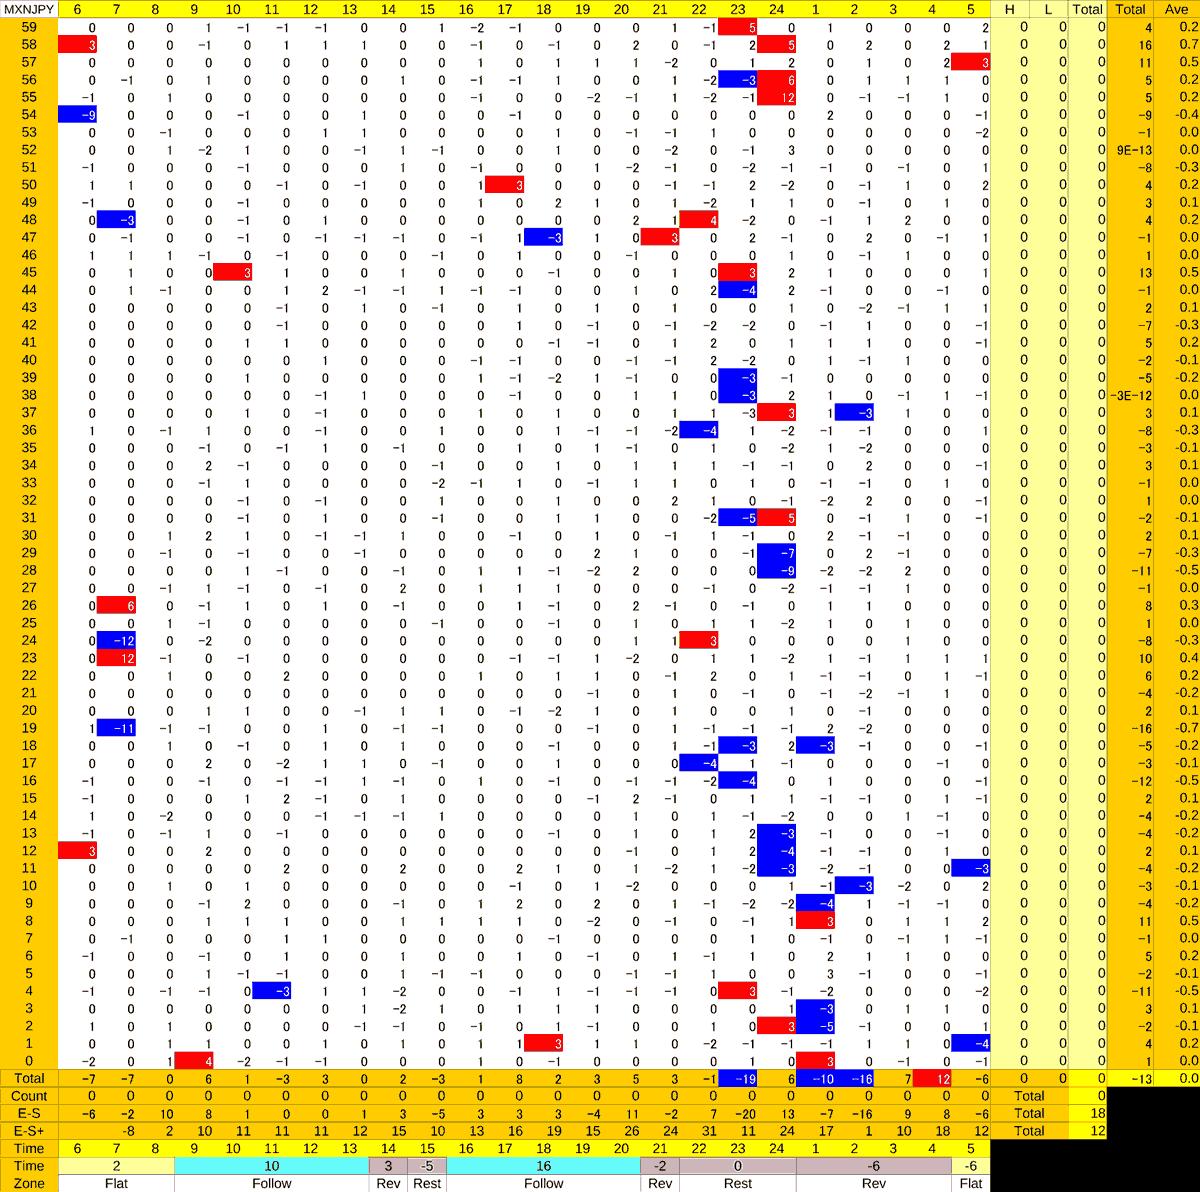 20201229_HS(3)MXNJPY